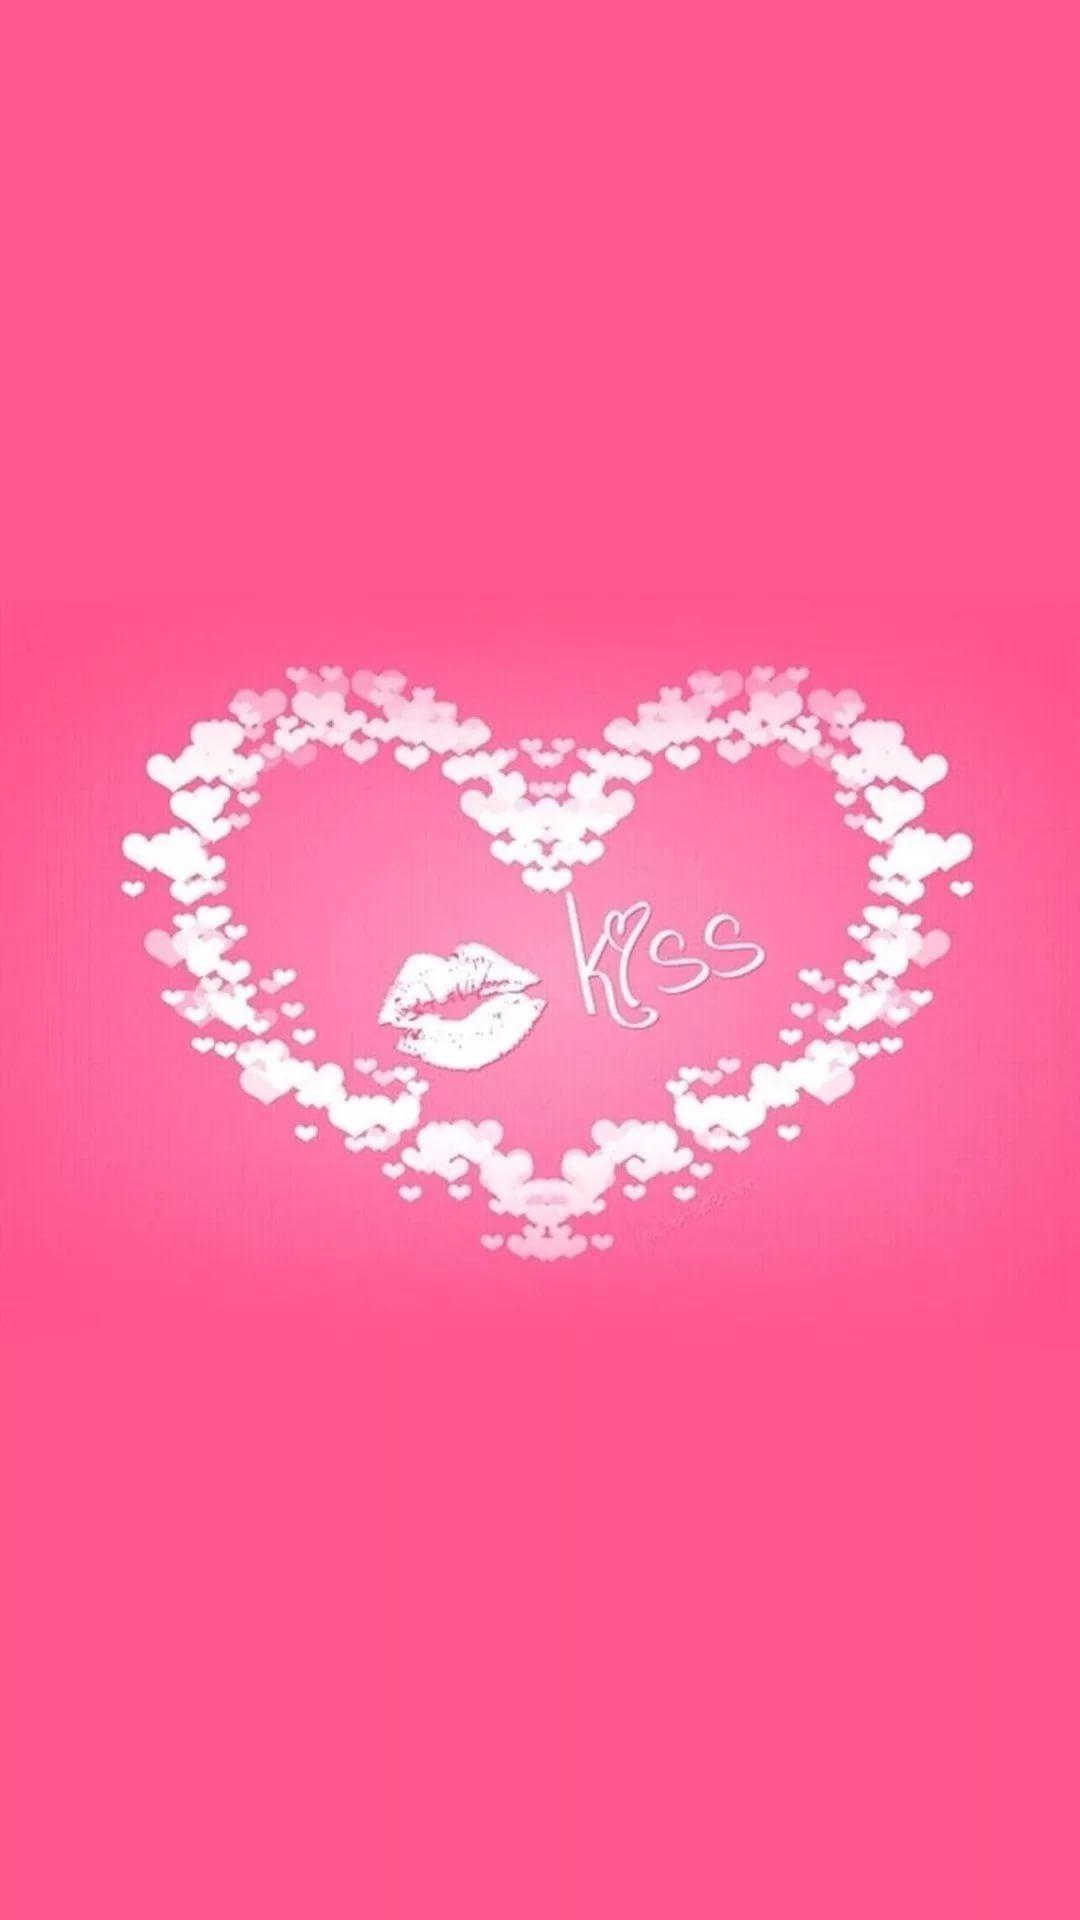 Cute Love HD wallpaper for mobile